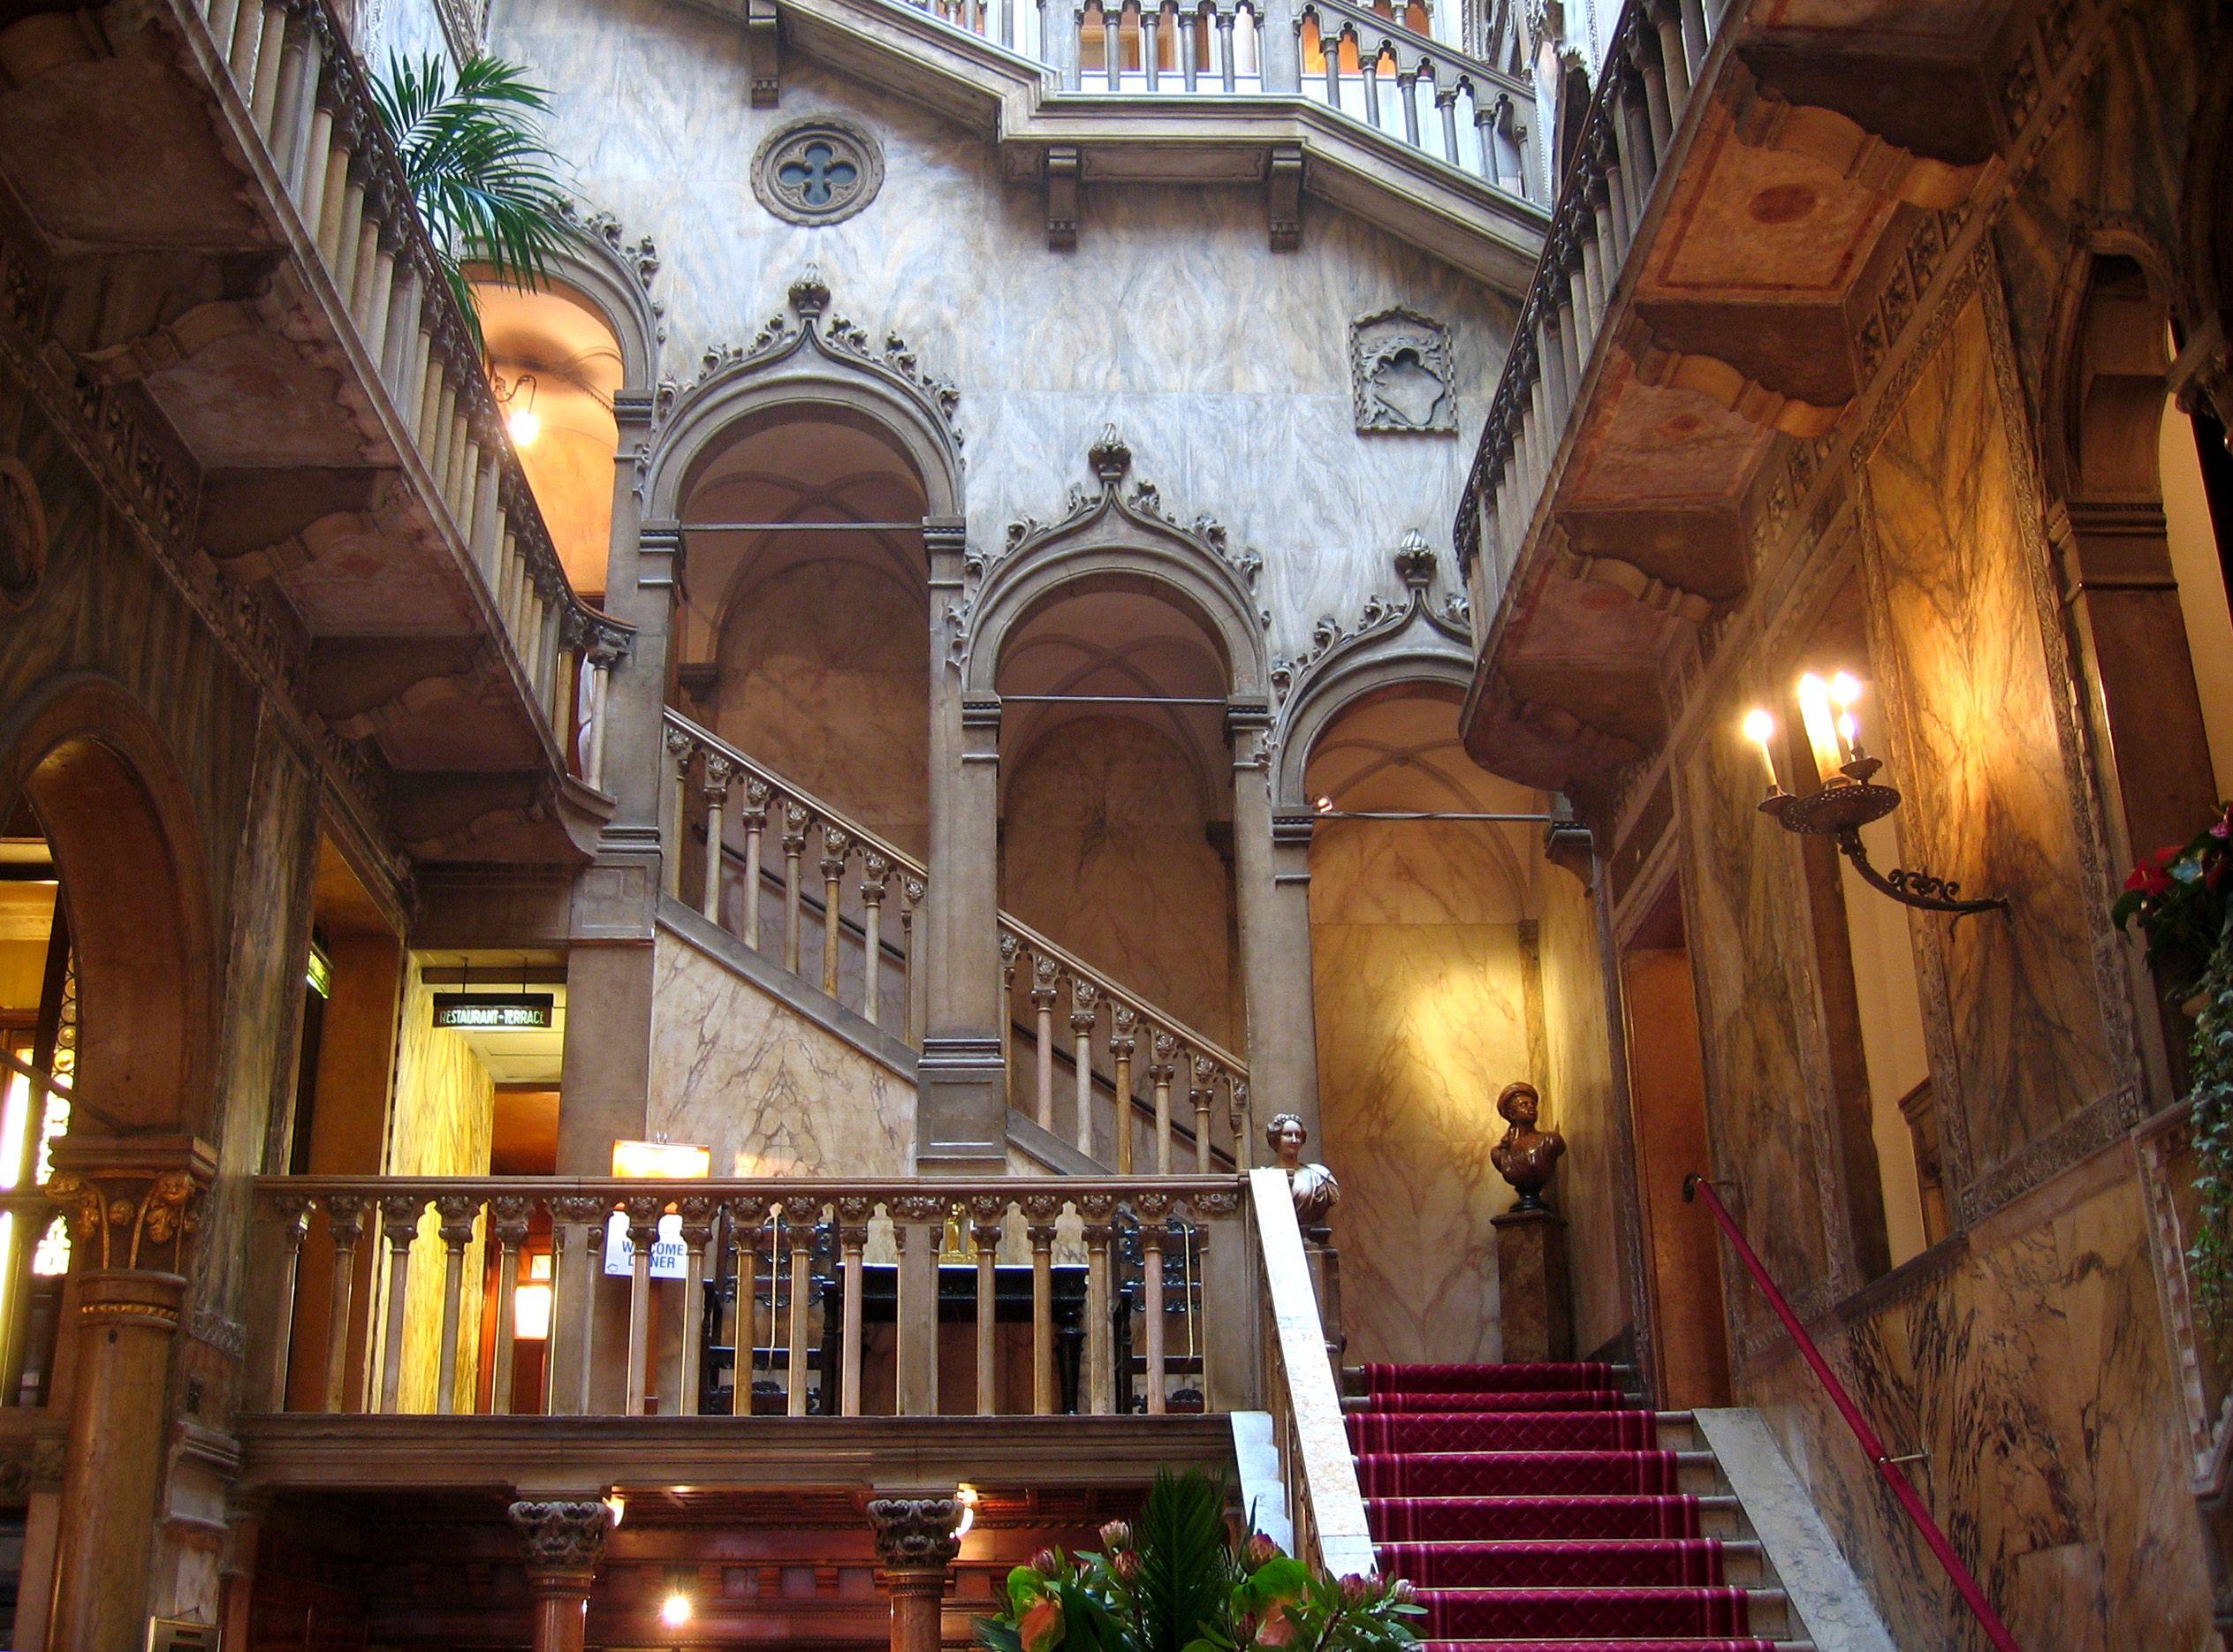 Venice hotel danielli amazing hotel in beautiful center venice was another world